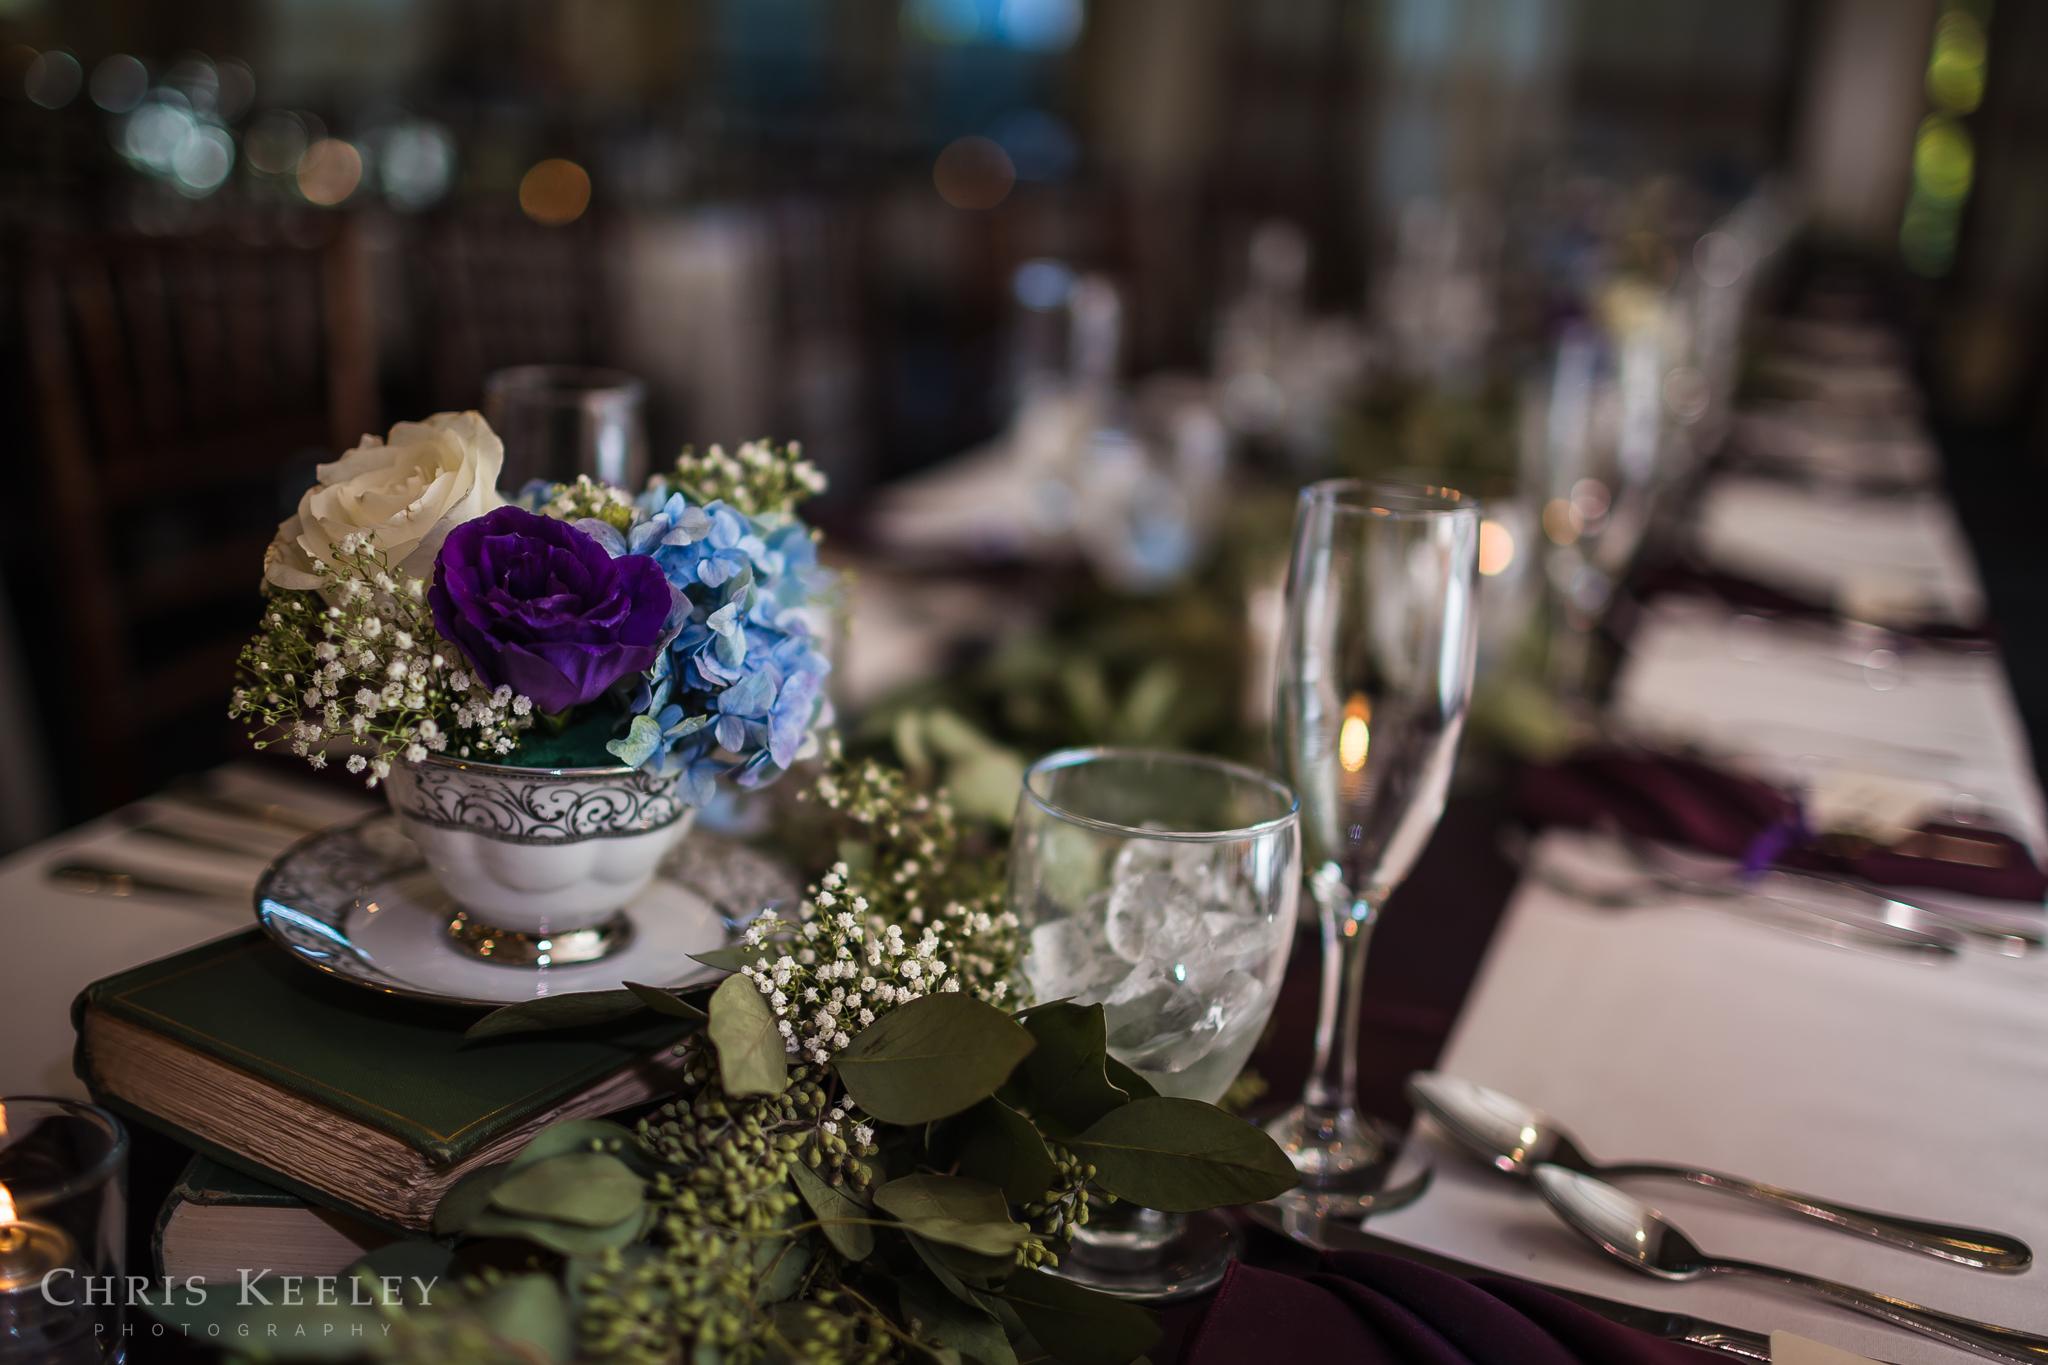 new-hampshire-wedding-photographer-three-chimneys-inn-chris-keeley-photography-20.jpg